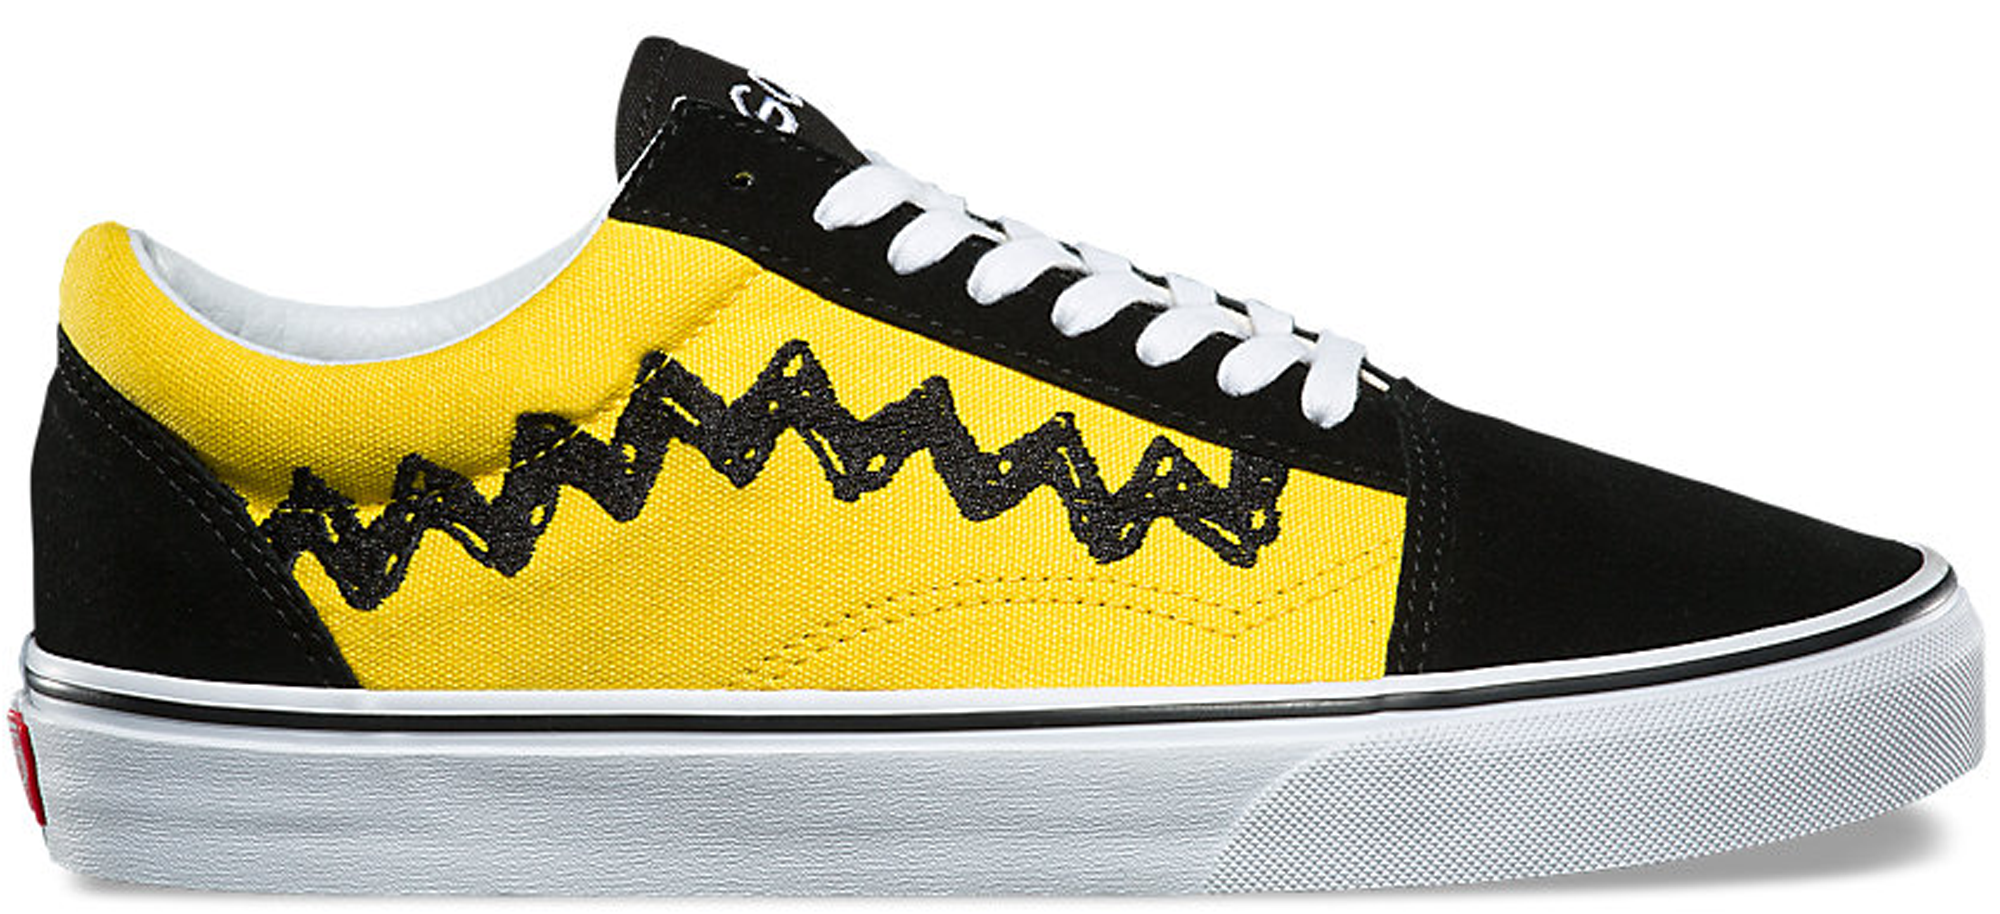 vans yellow and black. vans yellow and black